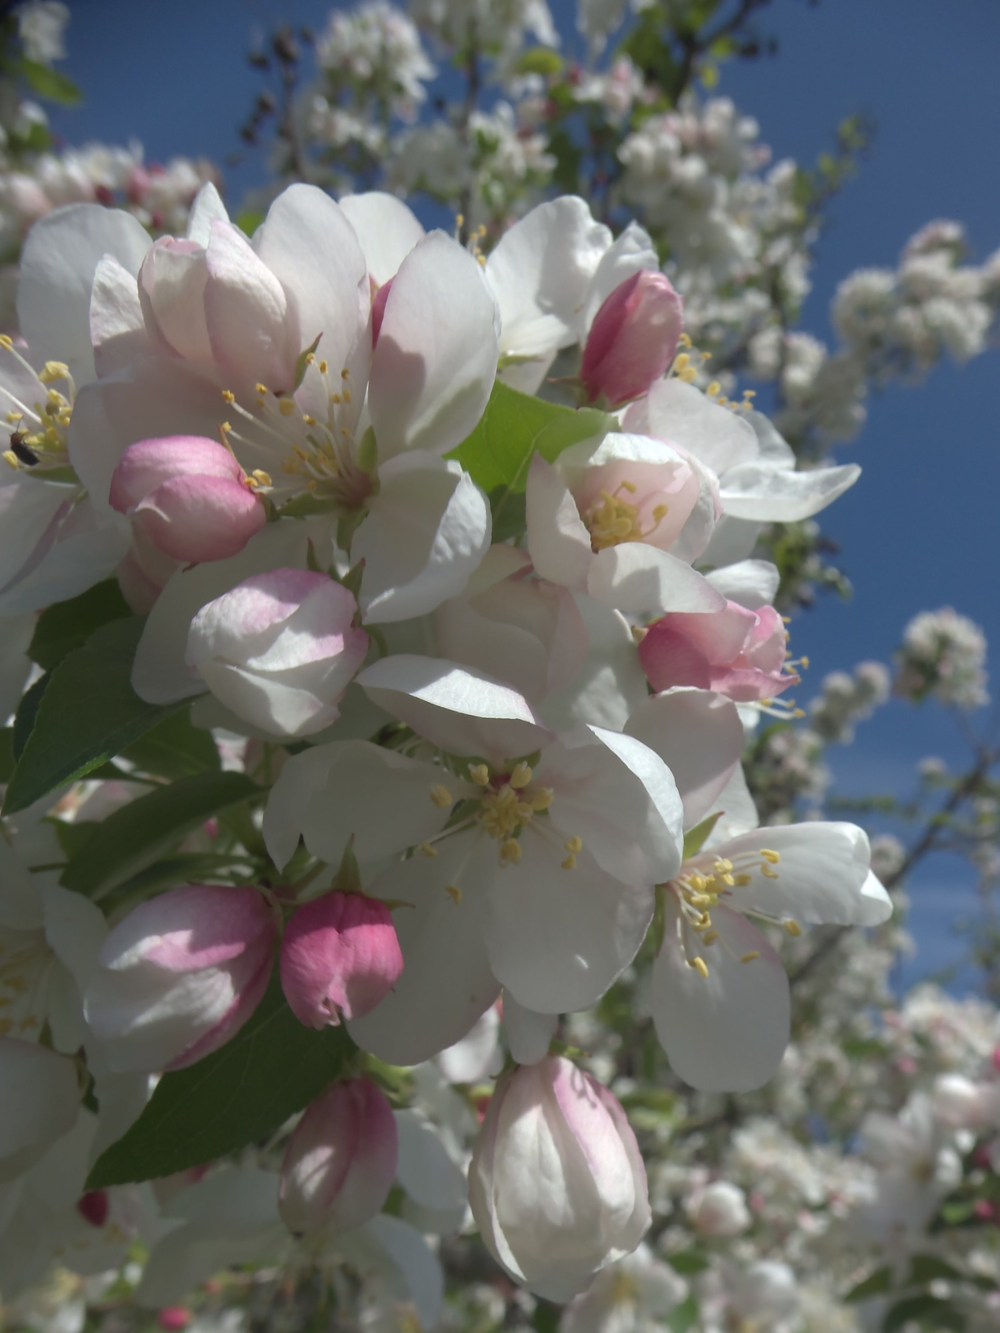 Apple blossom time ©candypaull.com